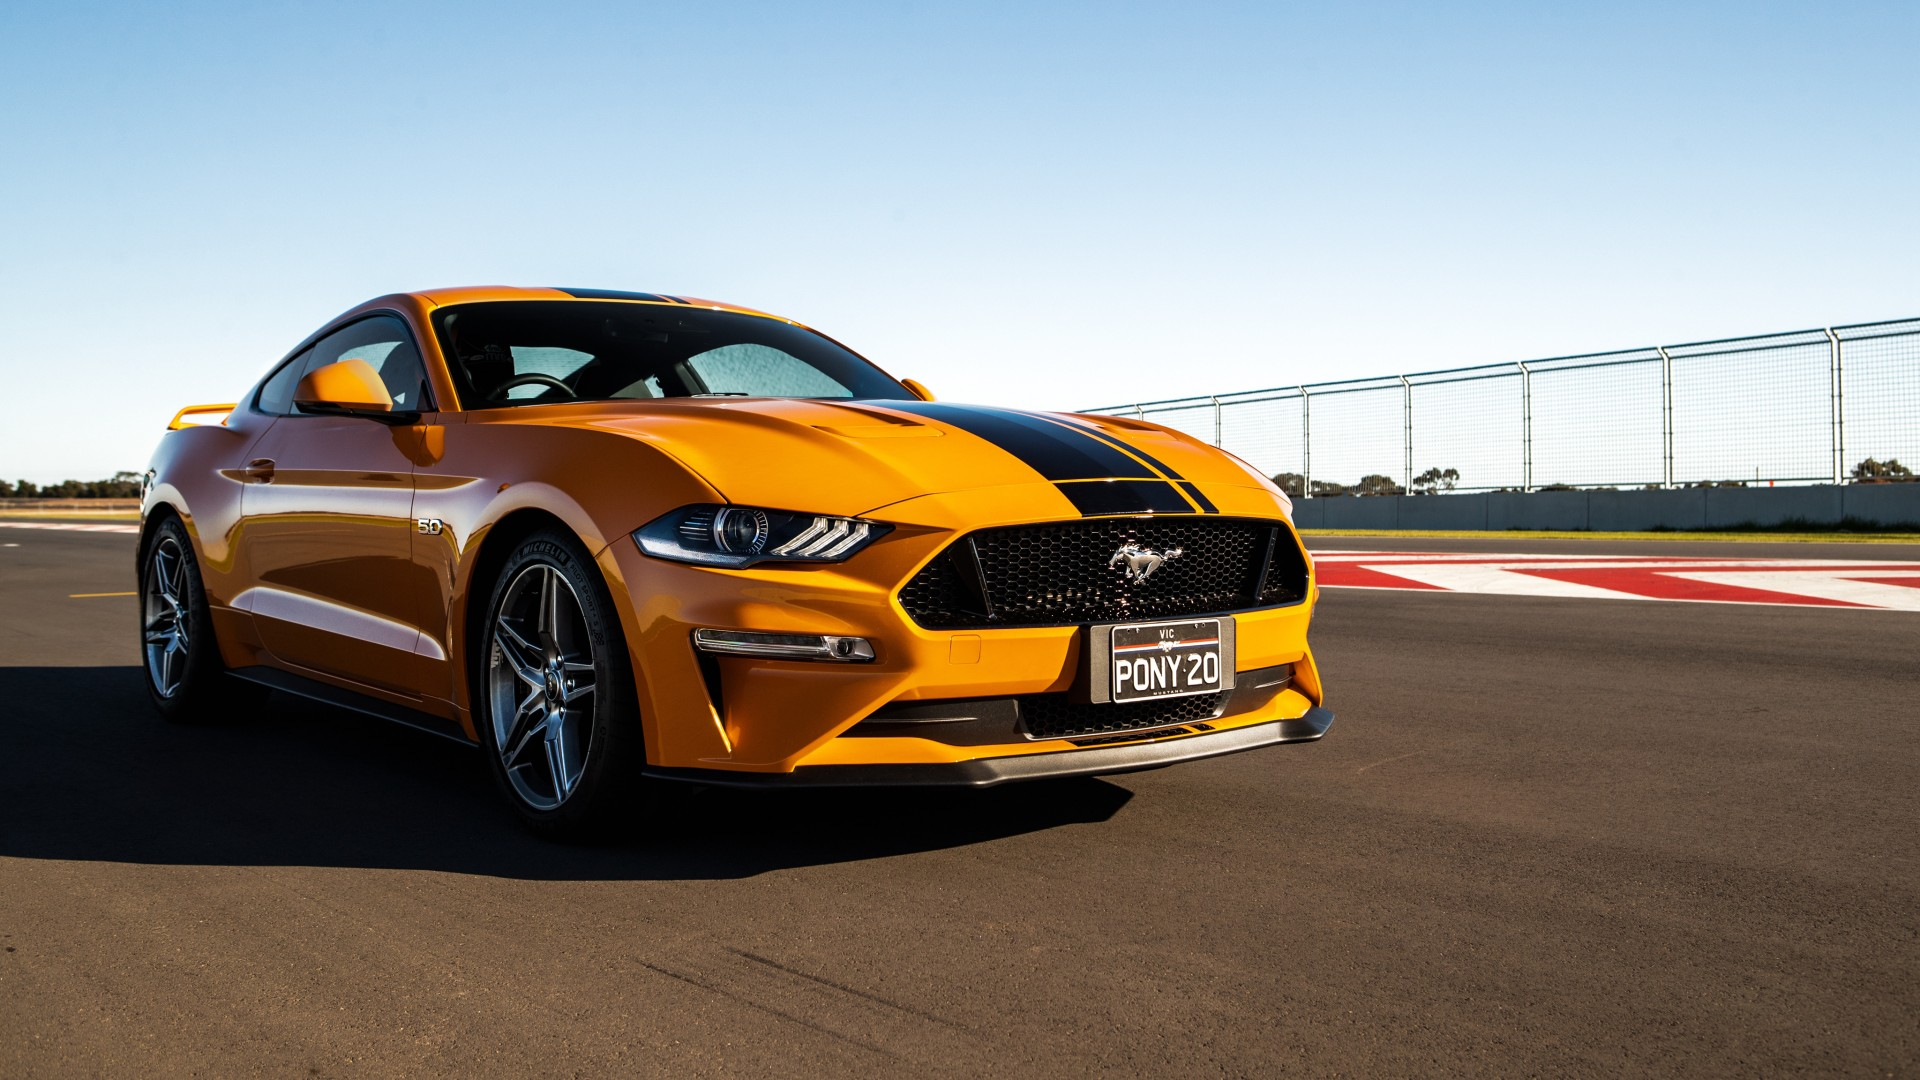 Ford Mustang Gt Fastback 2018 4k Wallpaper Hd Car